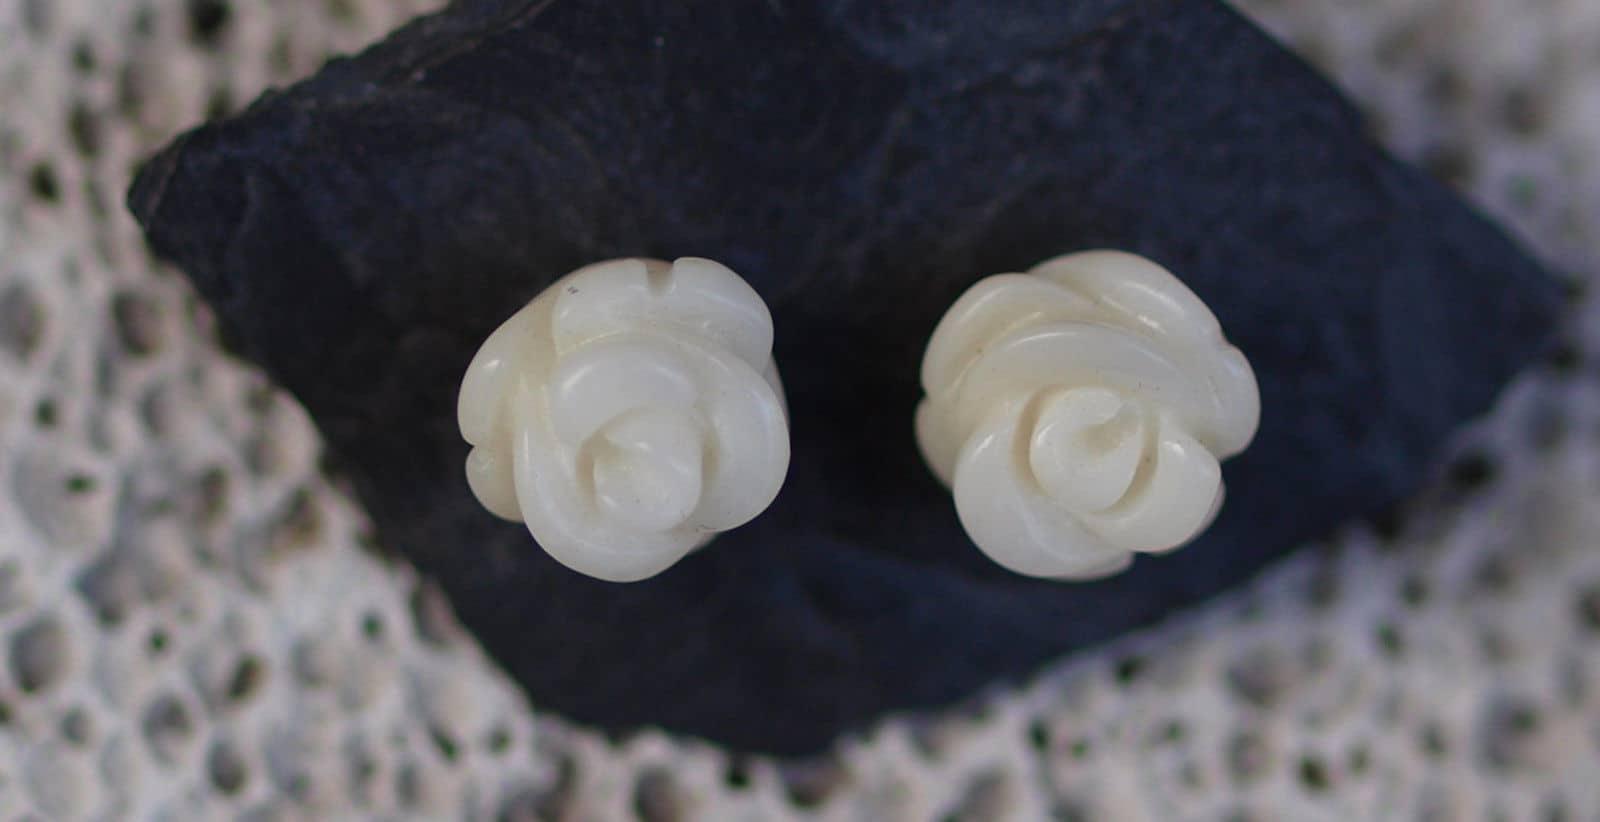 Ohrstecker Silber 925 Korallrosen Rosen weiße Koralle